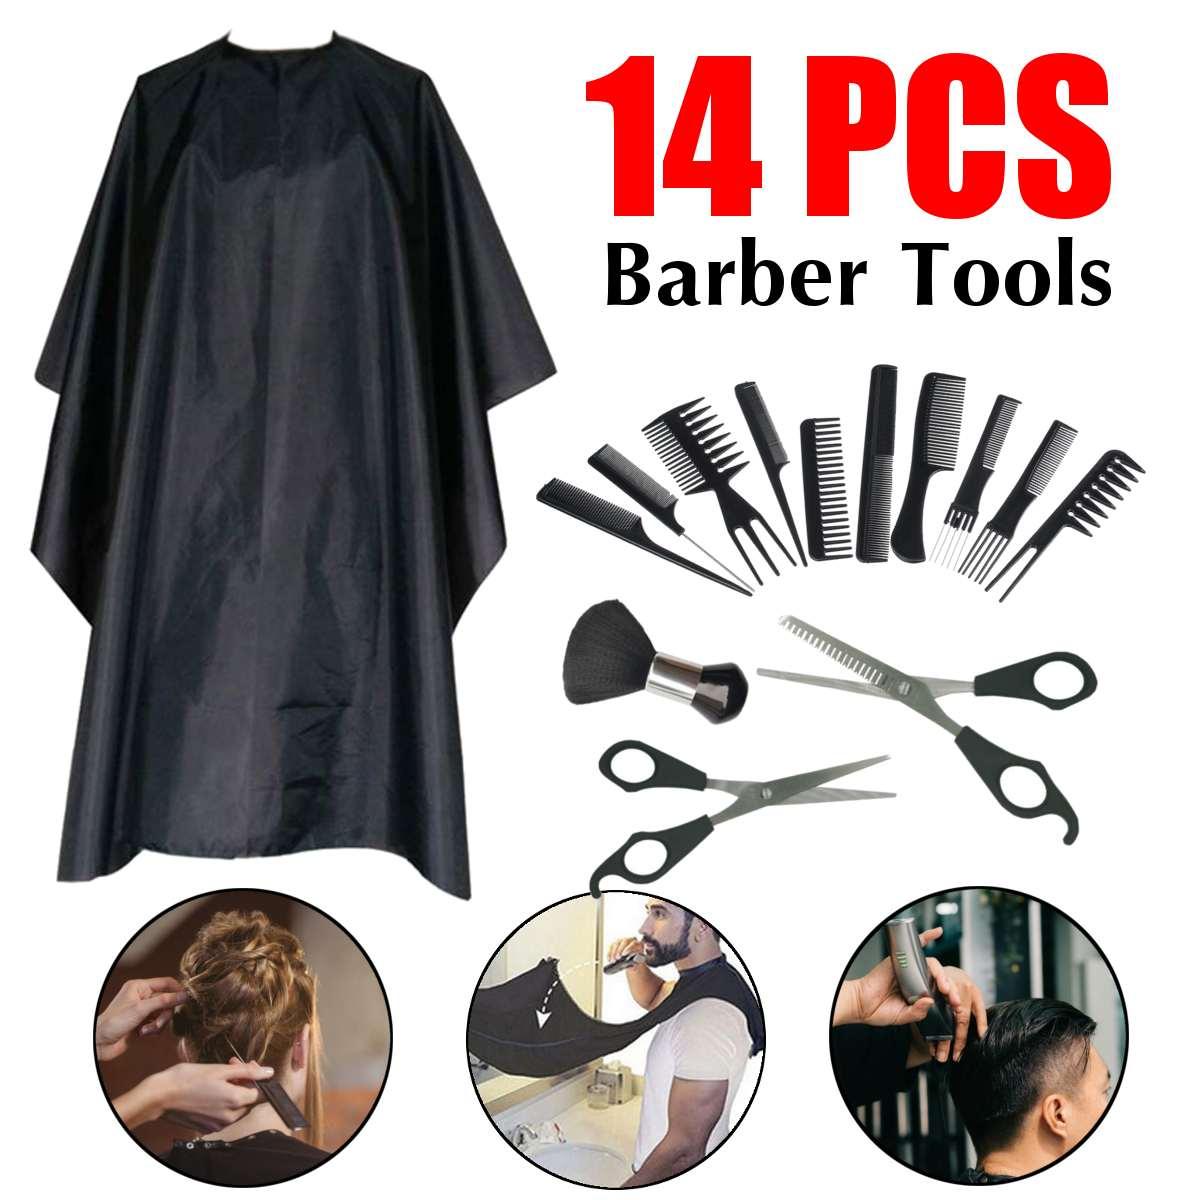 Electric Hair Clipper USB Rechargeable Baldheaded Shaver Beard Trimmer Professional Barber Haircut Mower Cutting Machine Razor enlarge